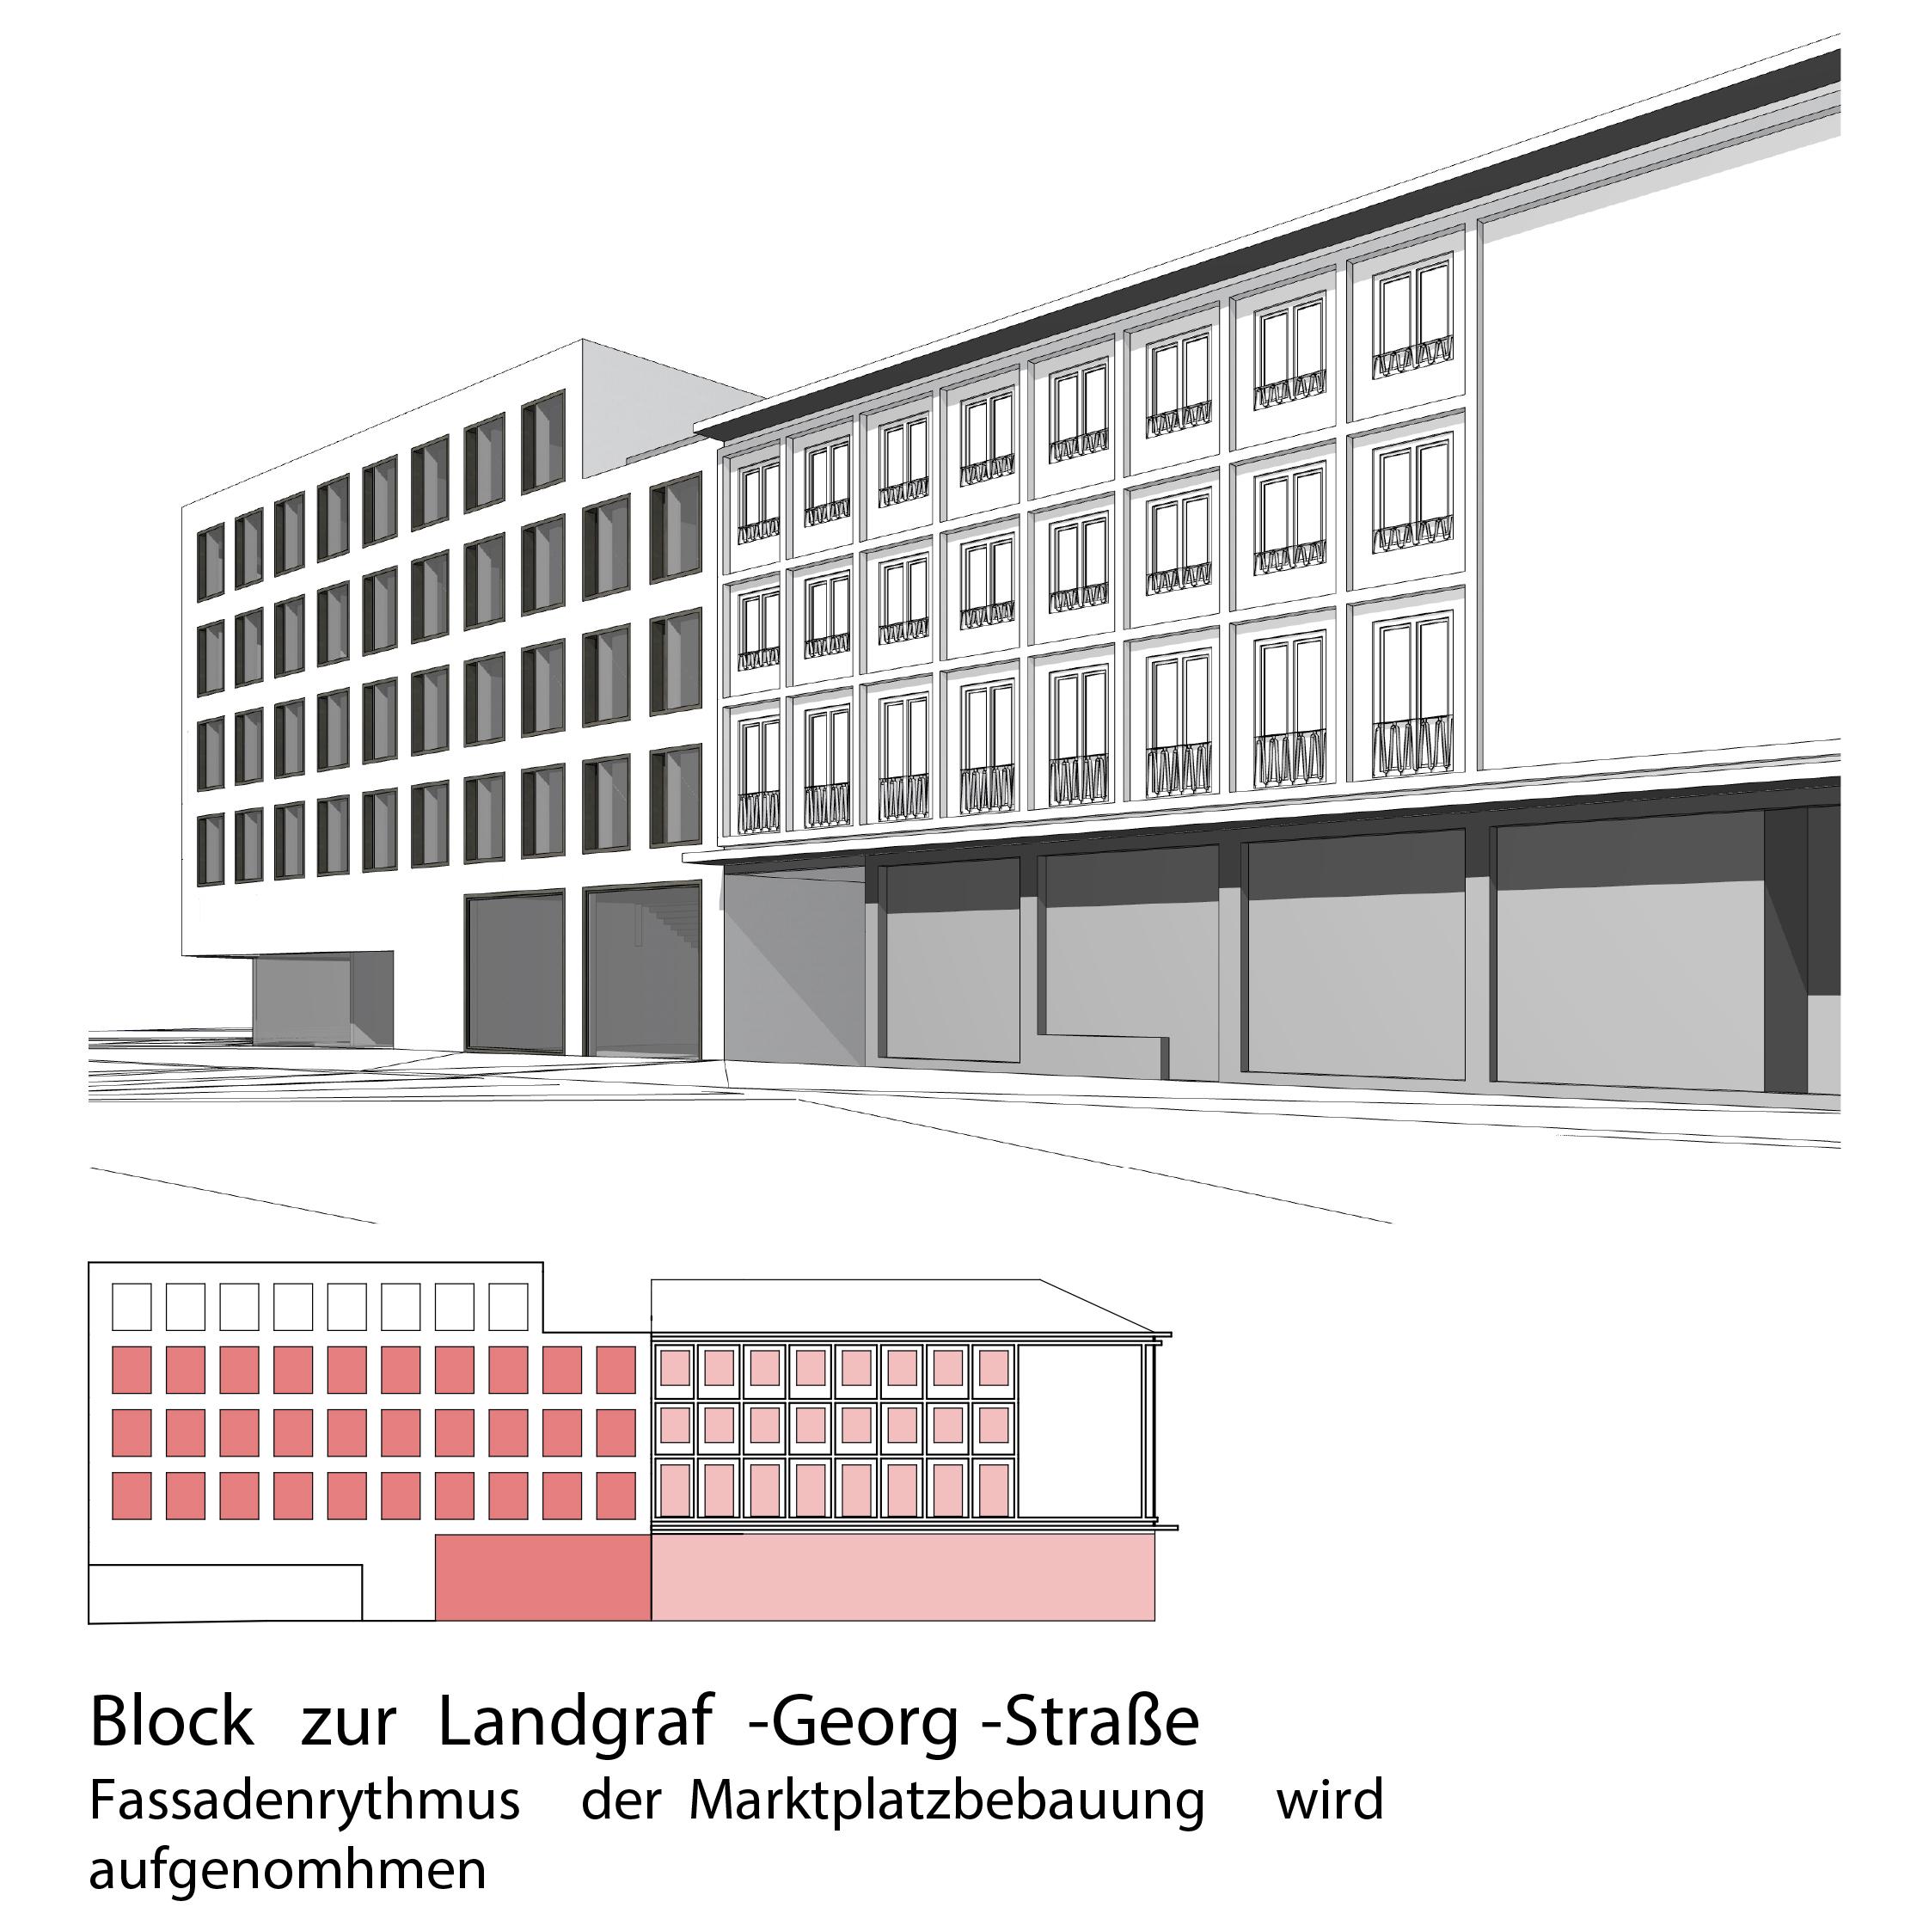 studioinges, Saladin-Eck, Darmstadt 2015 ff., Ansicht Marktplatz, Abb.: studioinges